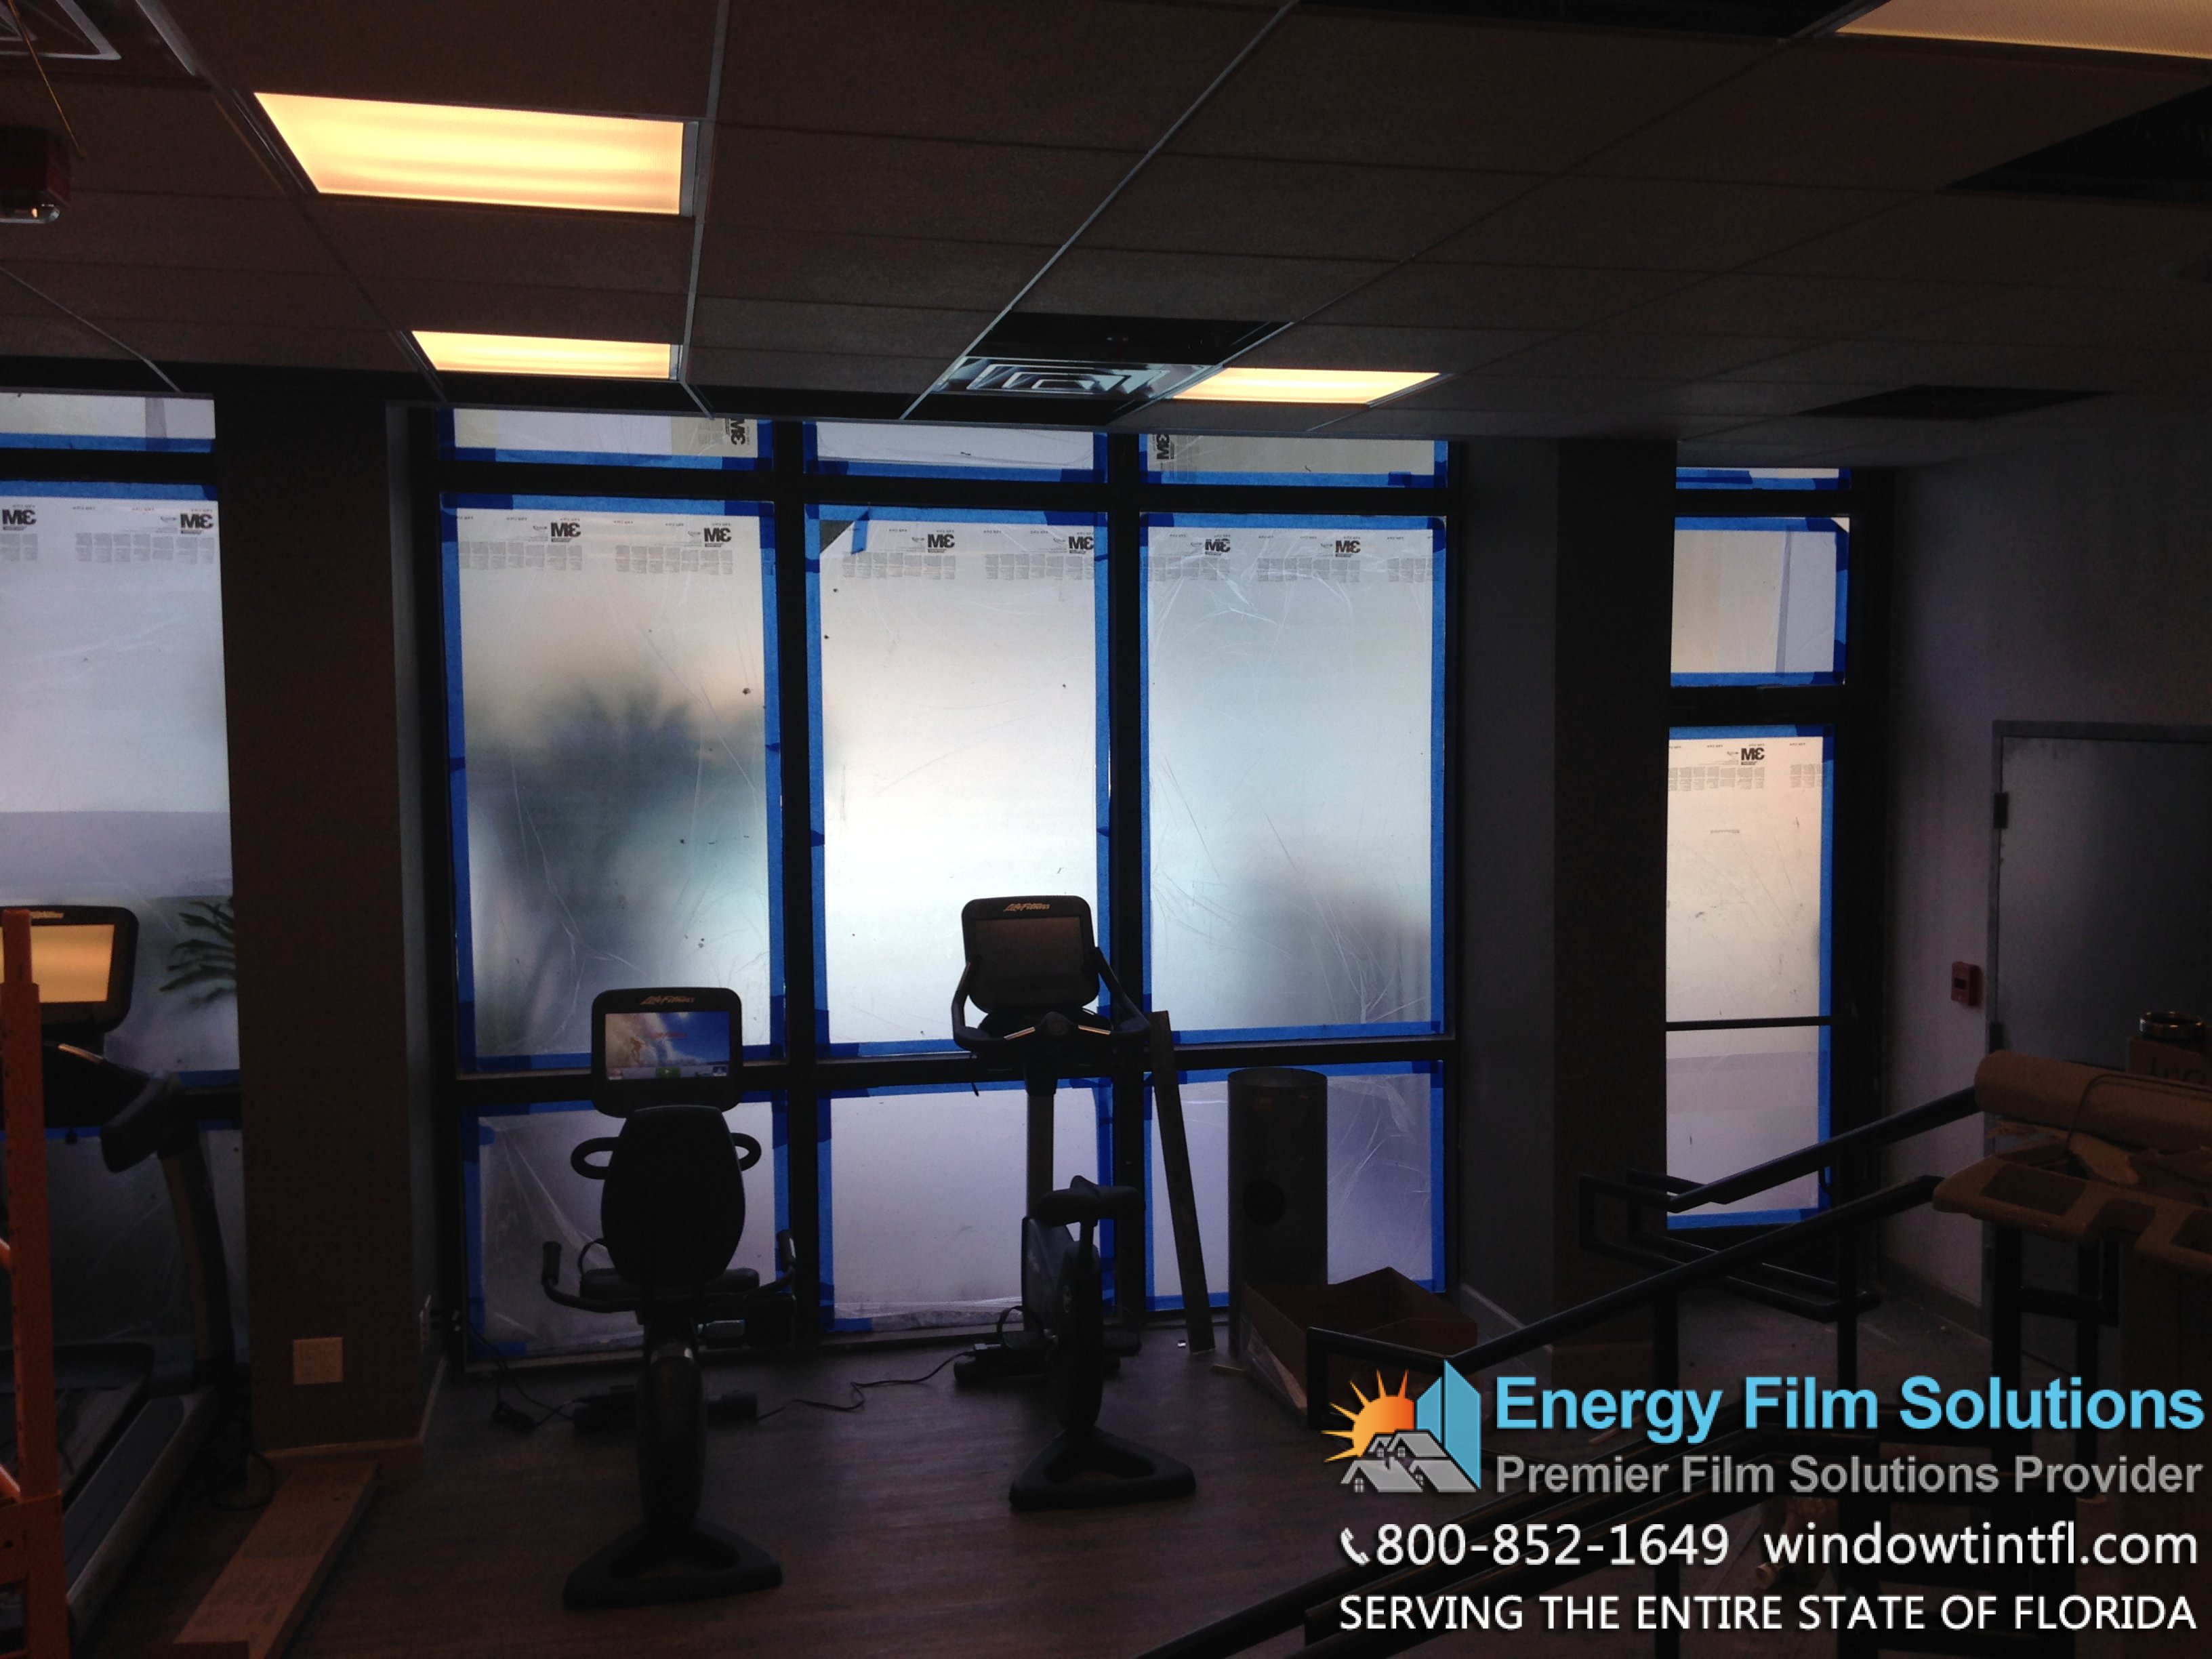 solar control window tinting uv blocking window film. Black Bedroom Furniture Sets. Home Design Ideas